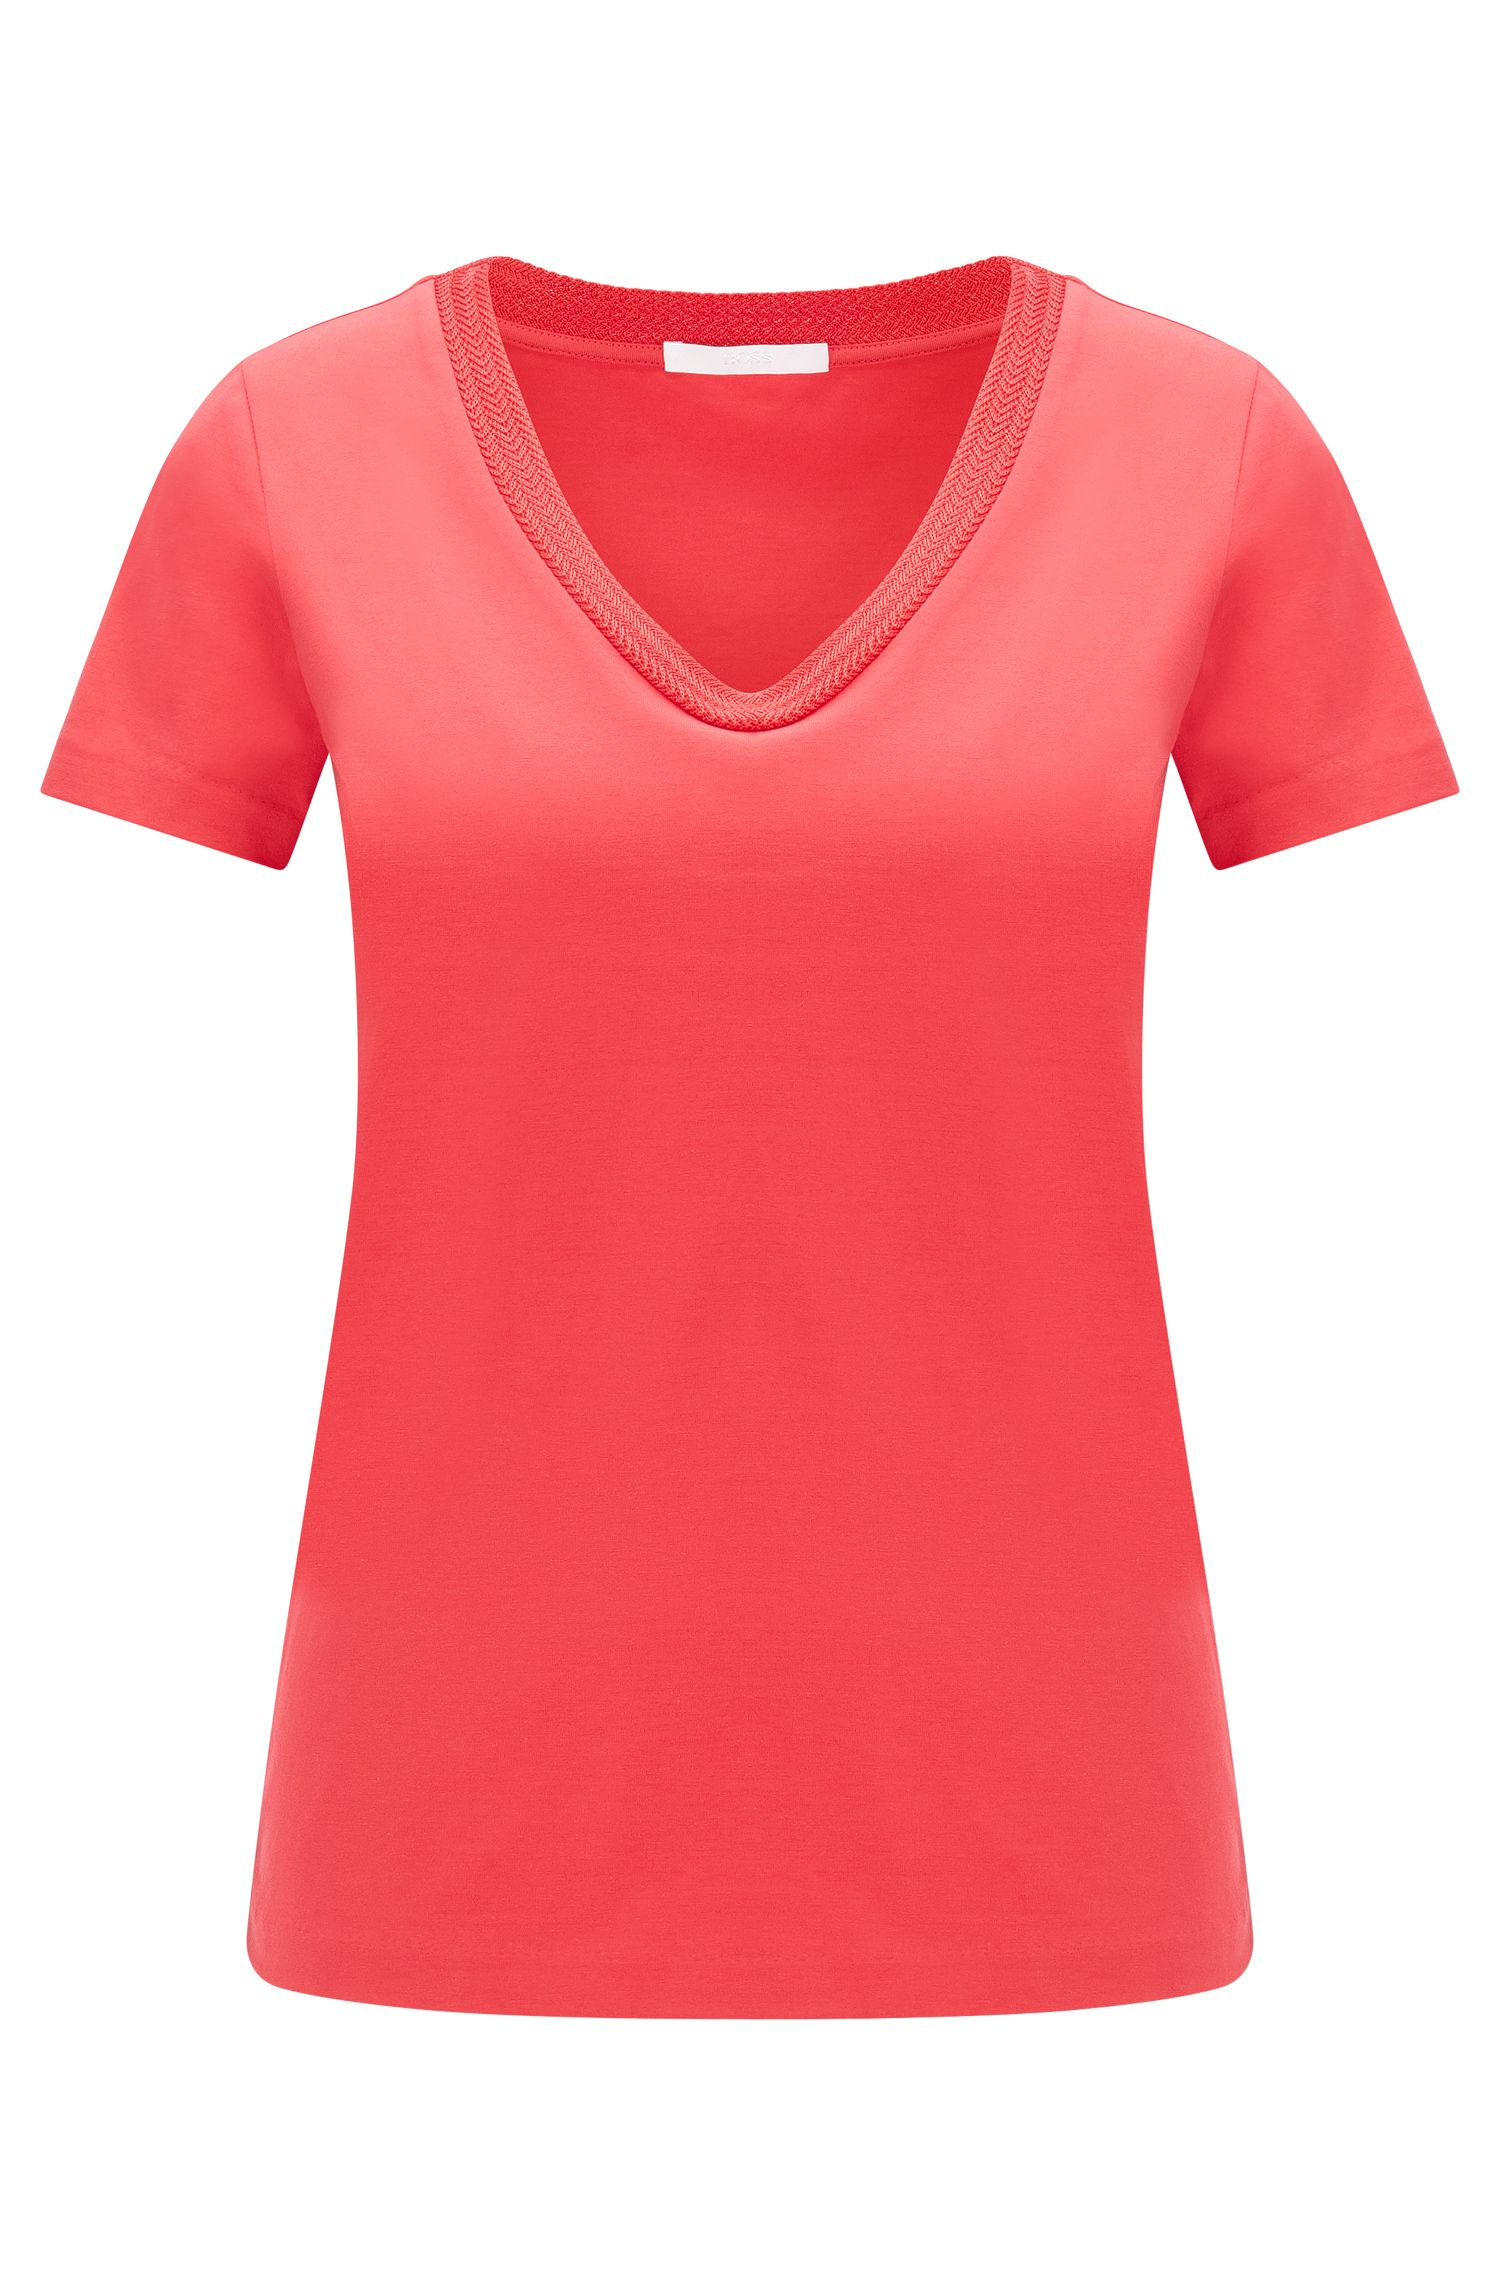 T-shirt cintré en coton extensible: «Estana»